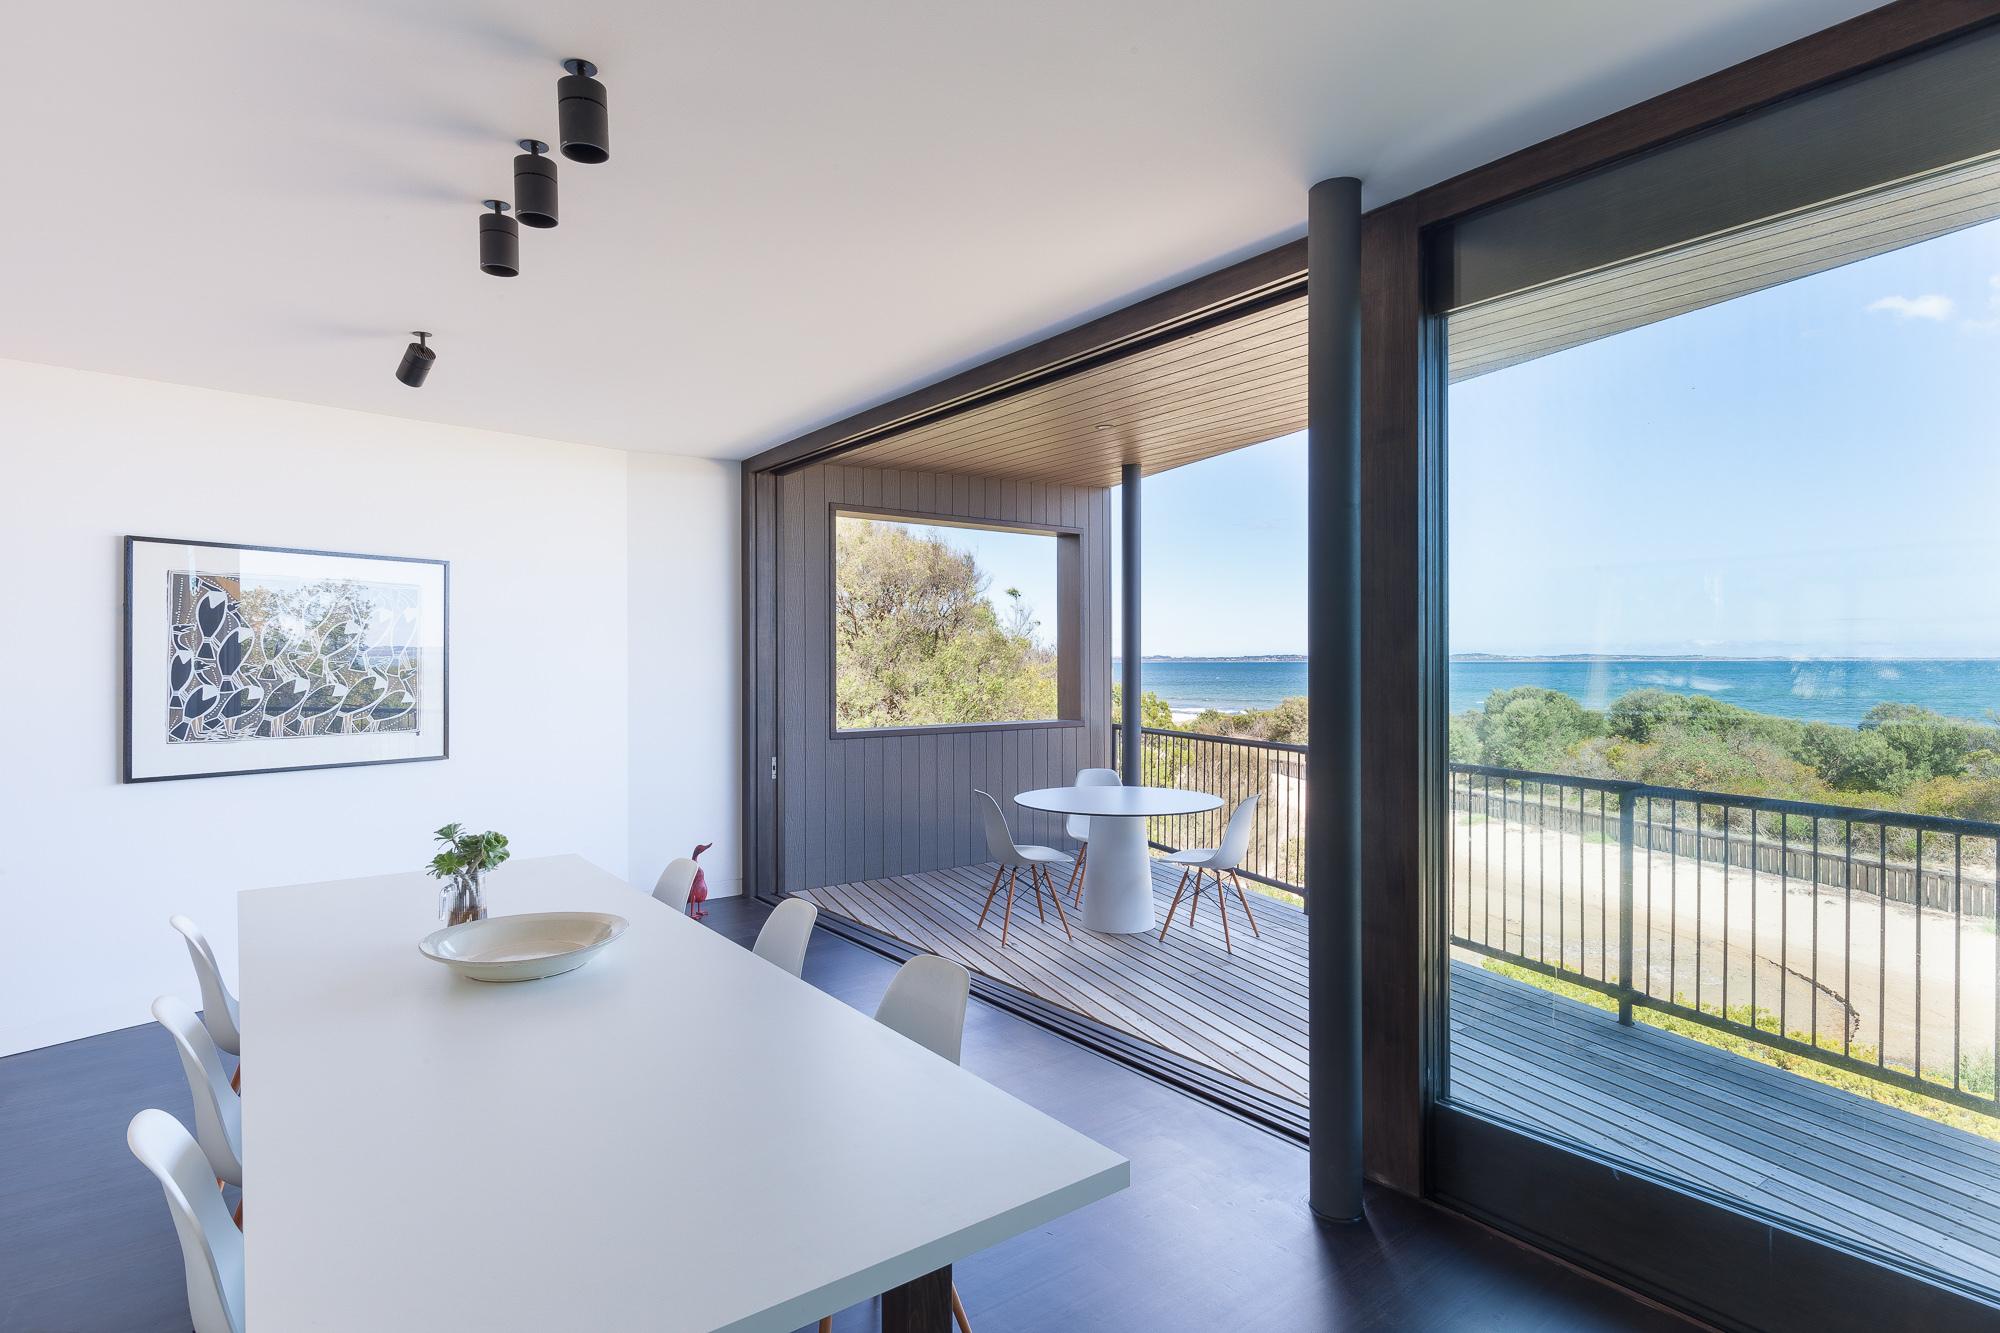 Gallery of residence j c open studio pty ltd 3 for Architecture design studio pty ltd